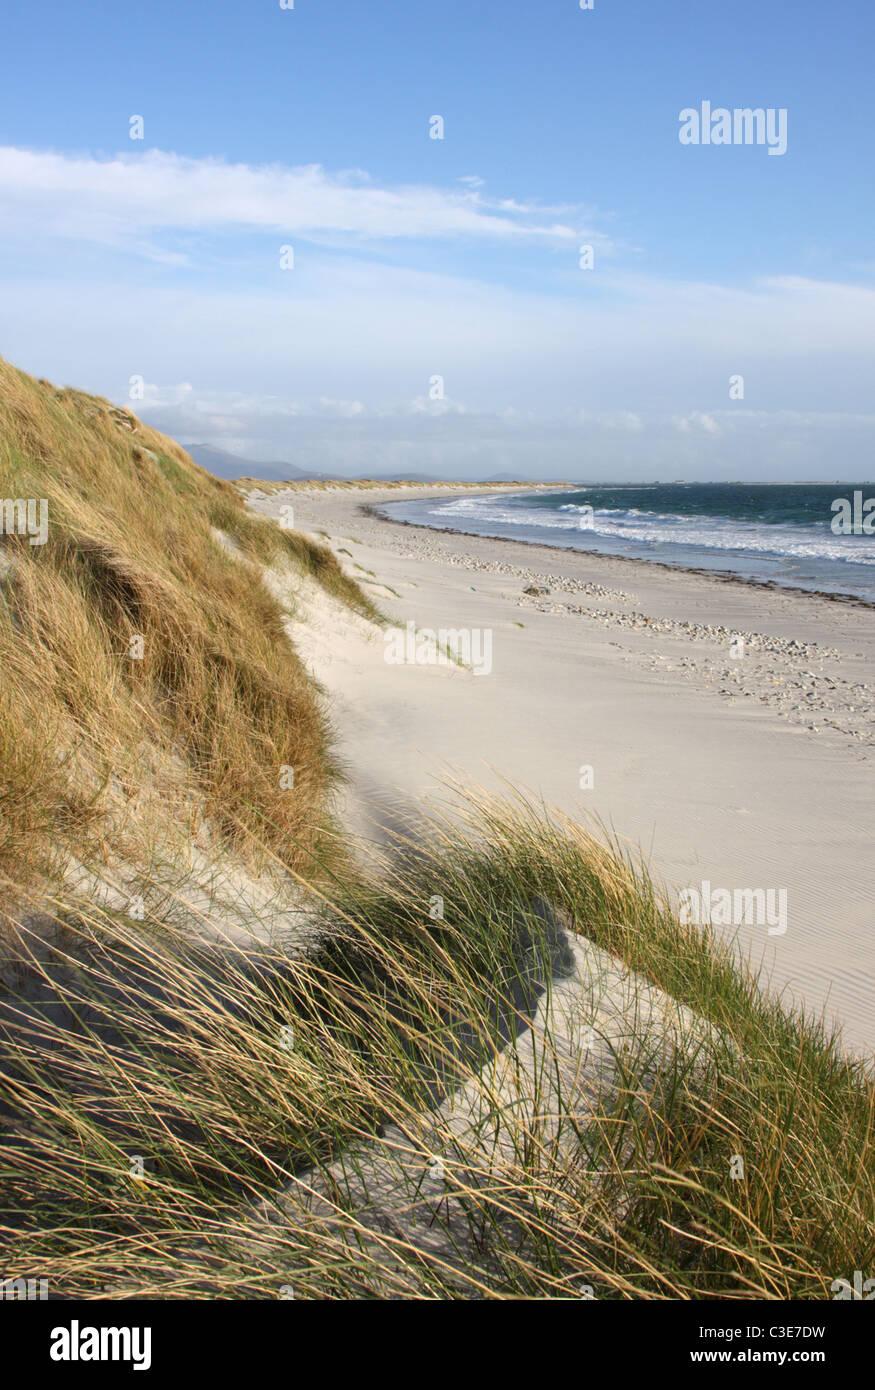 Sand dunes, Poll Na Crann ('Stinky Bay'), Benbecula, Outer Hebrides, Scotland, UK, May, 2010 - Stock Image